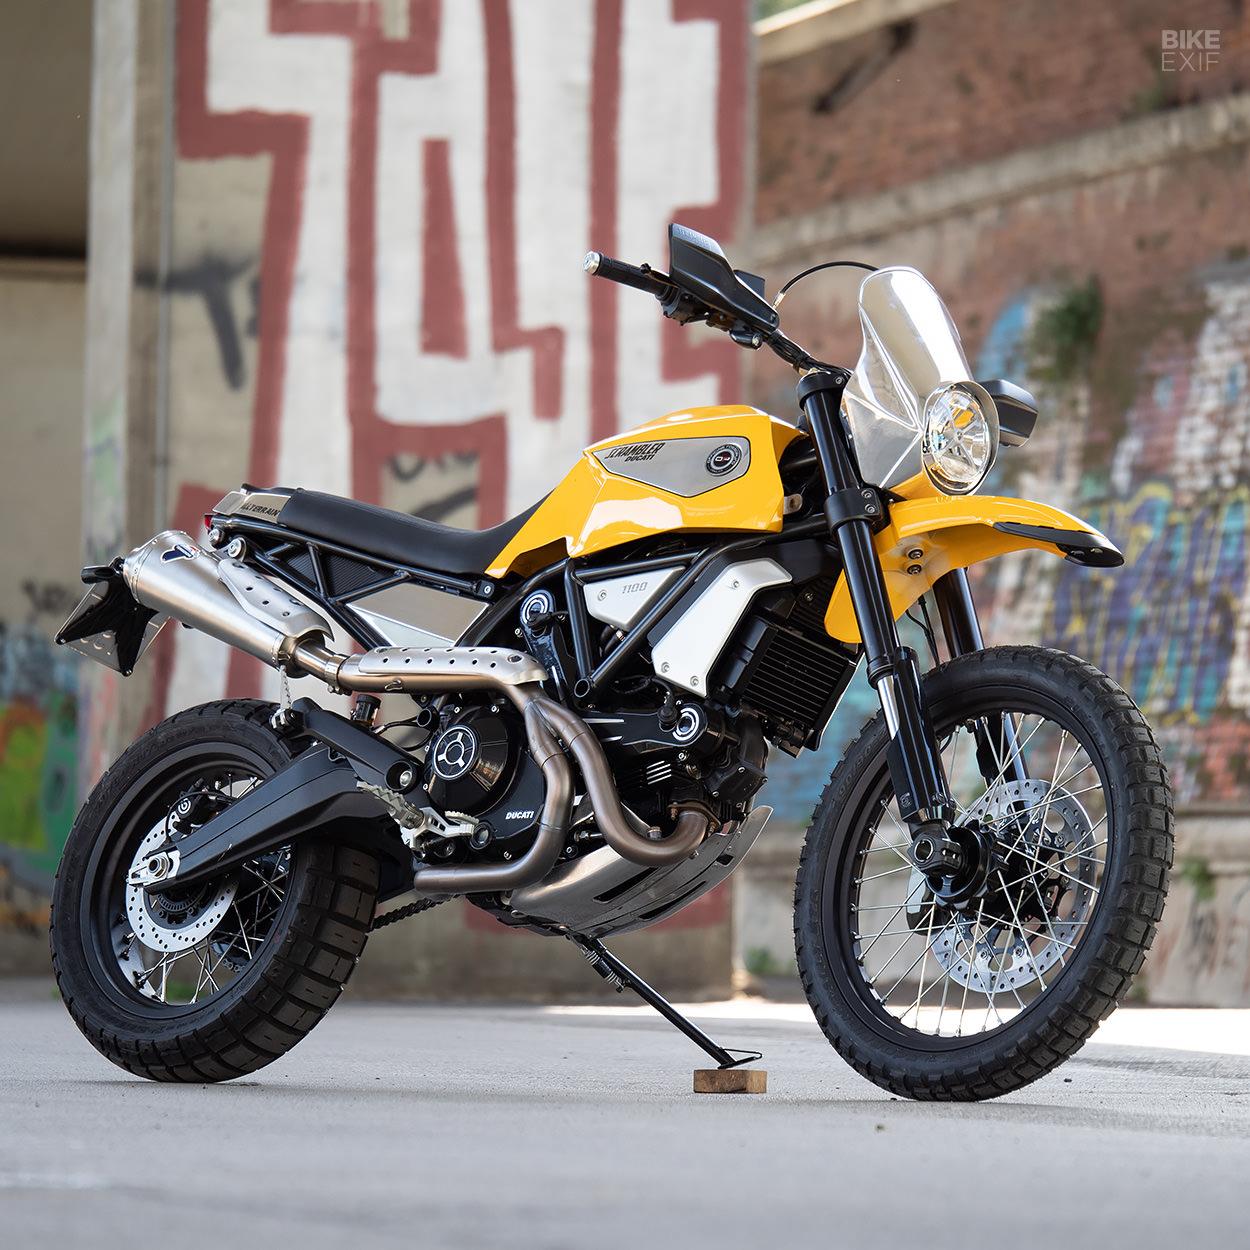 Ducati Scrambler 1100 by Officine RossoPuro